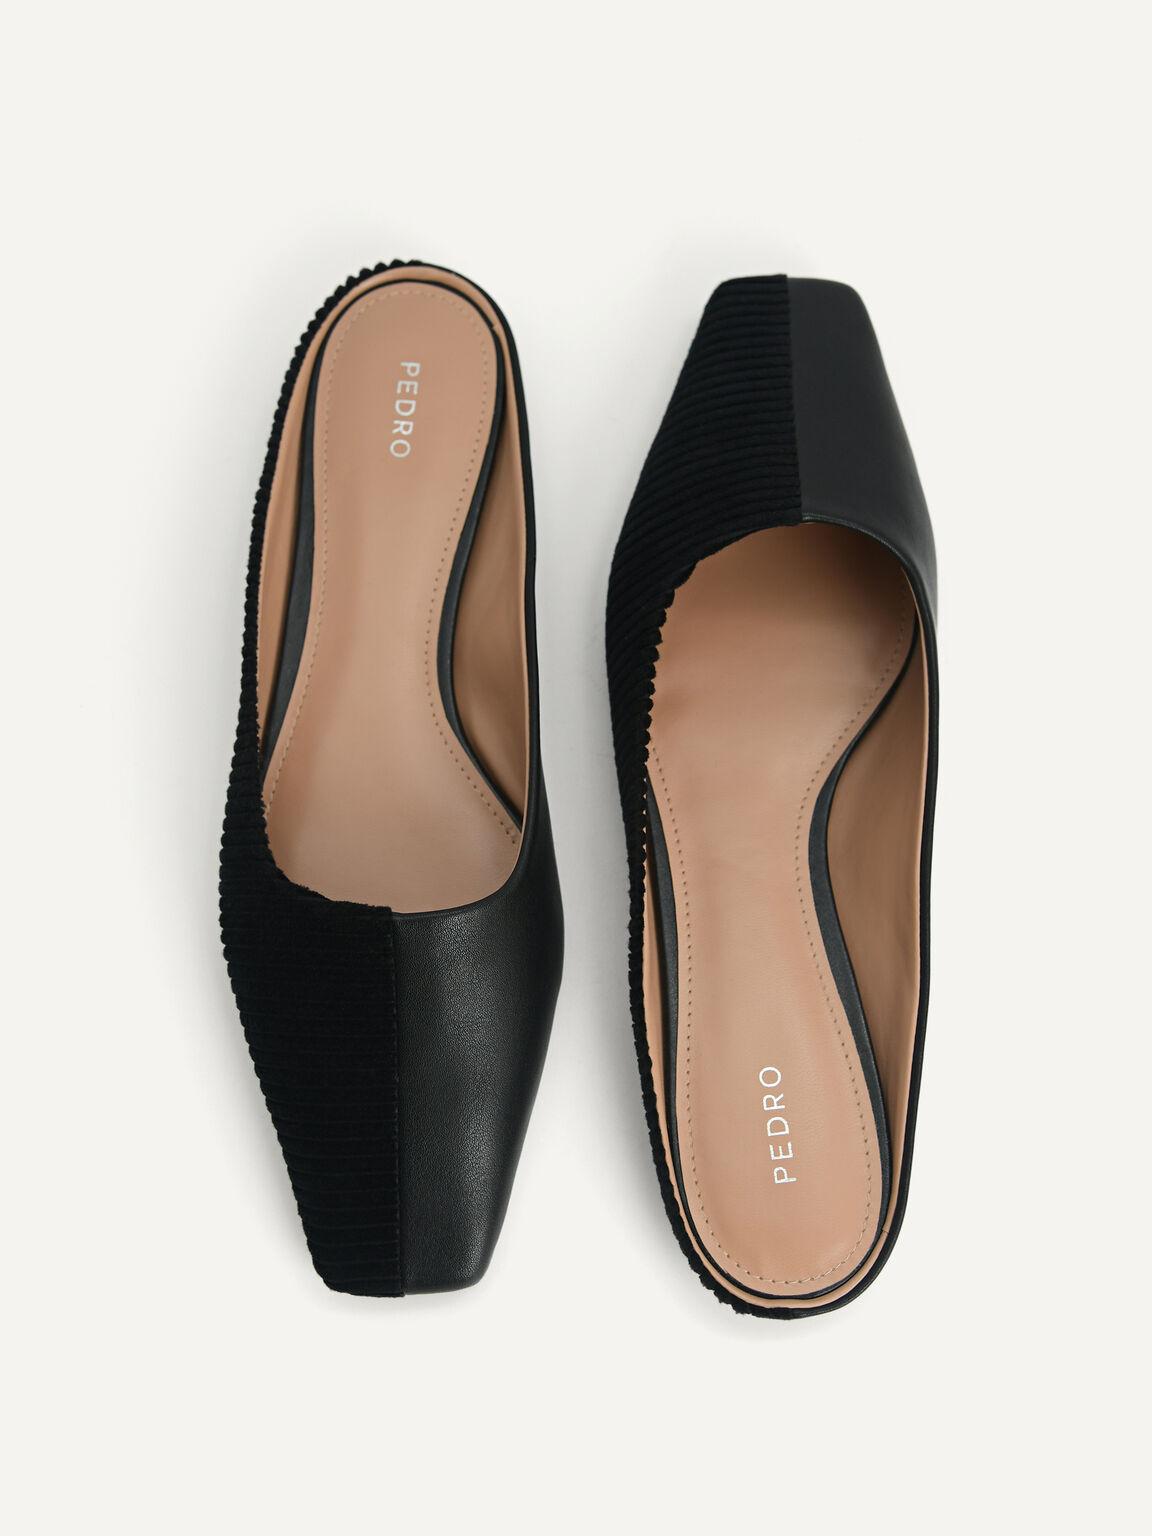 Corduroy Slip-On Flats, Black, hi-res